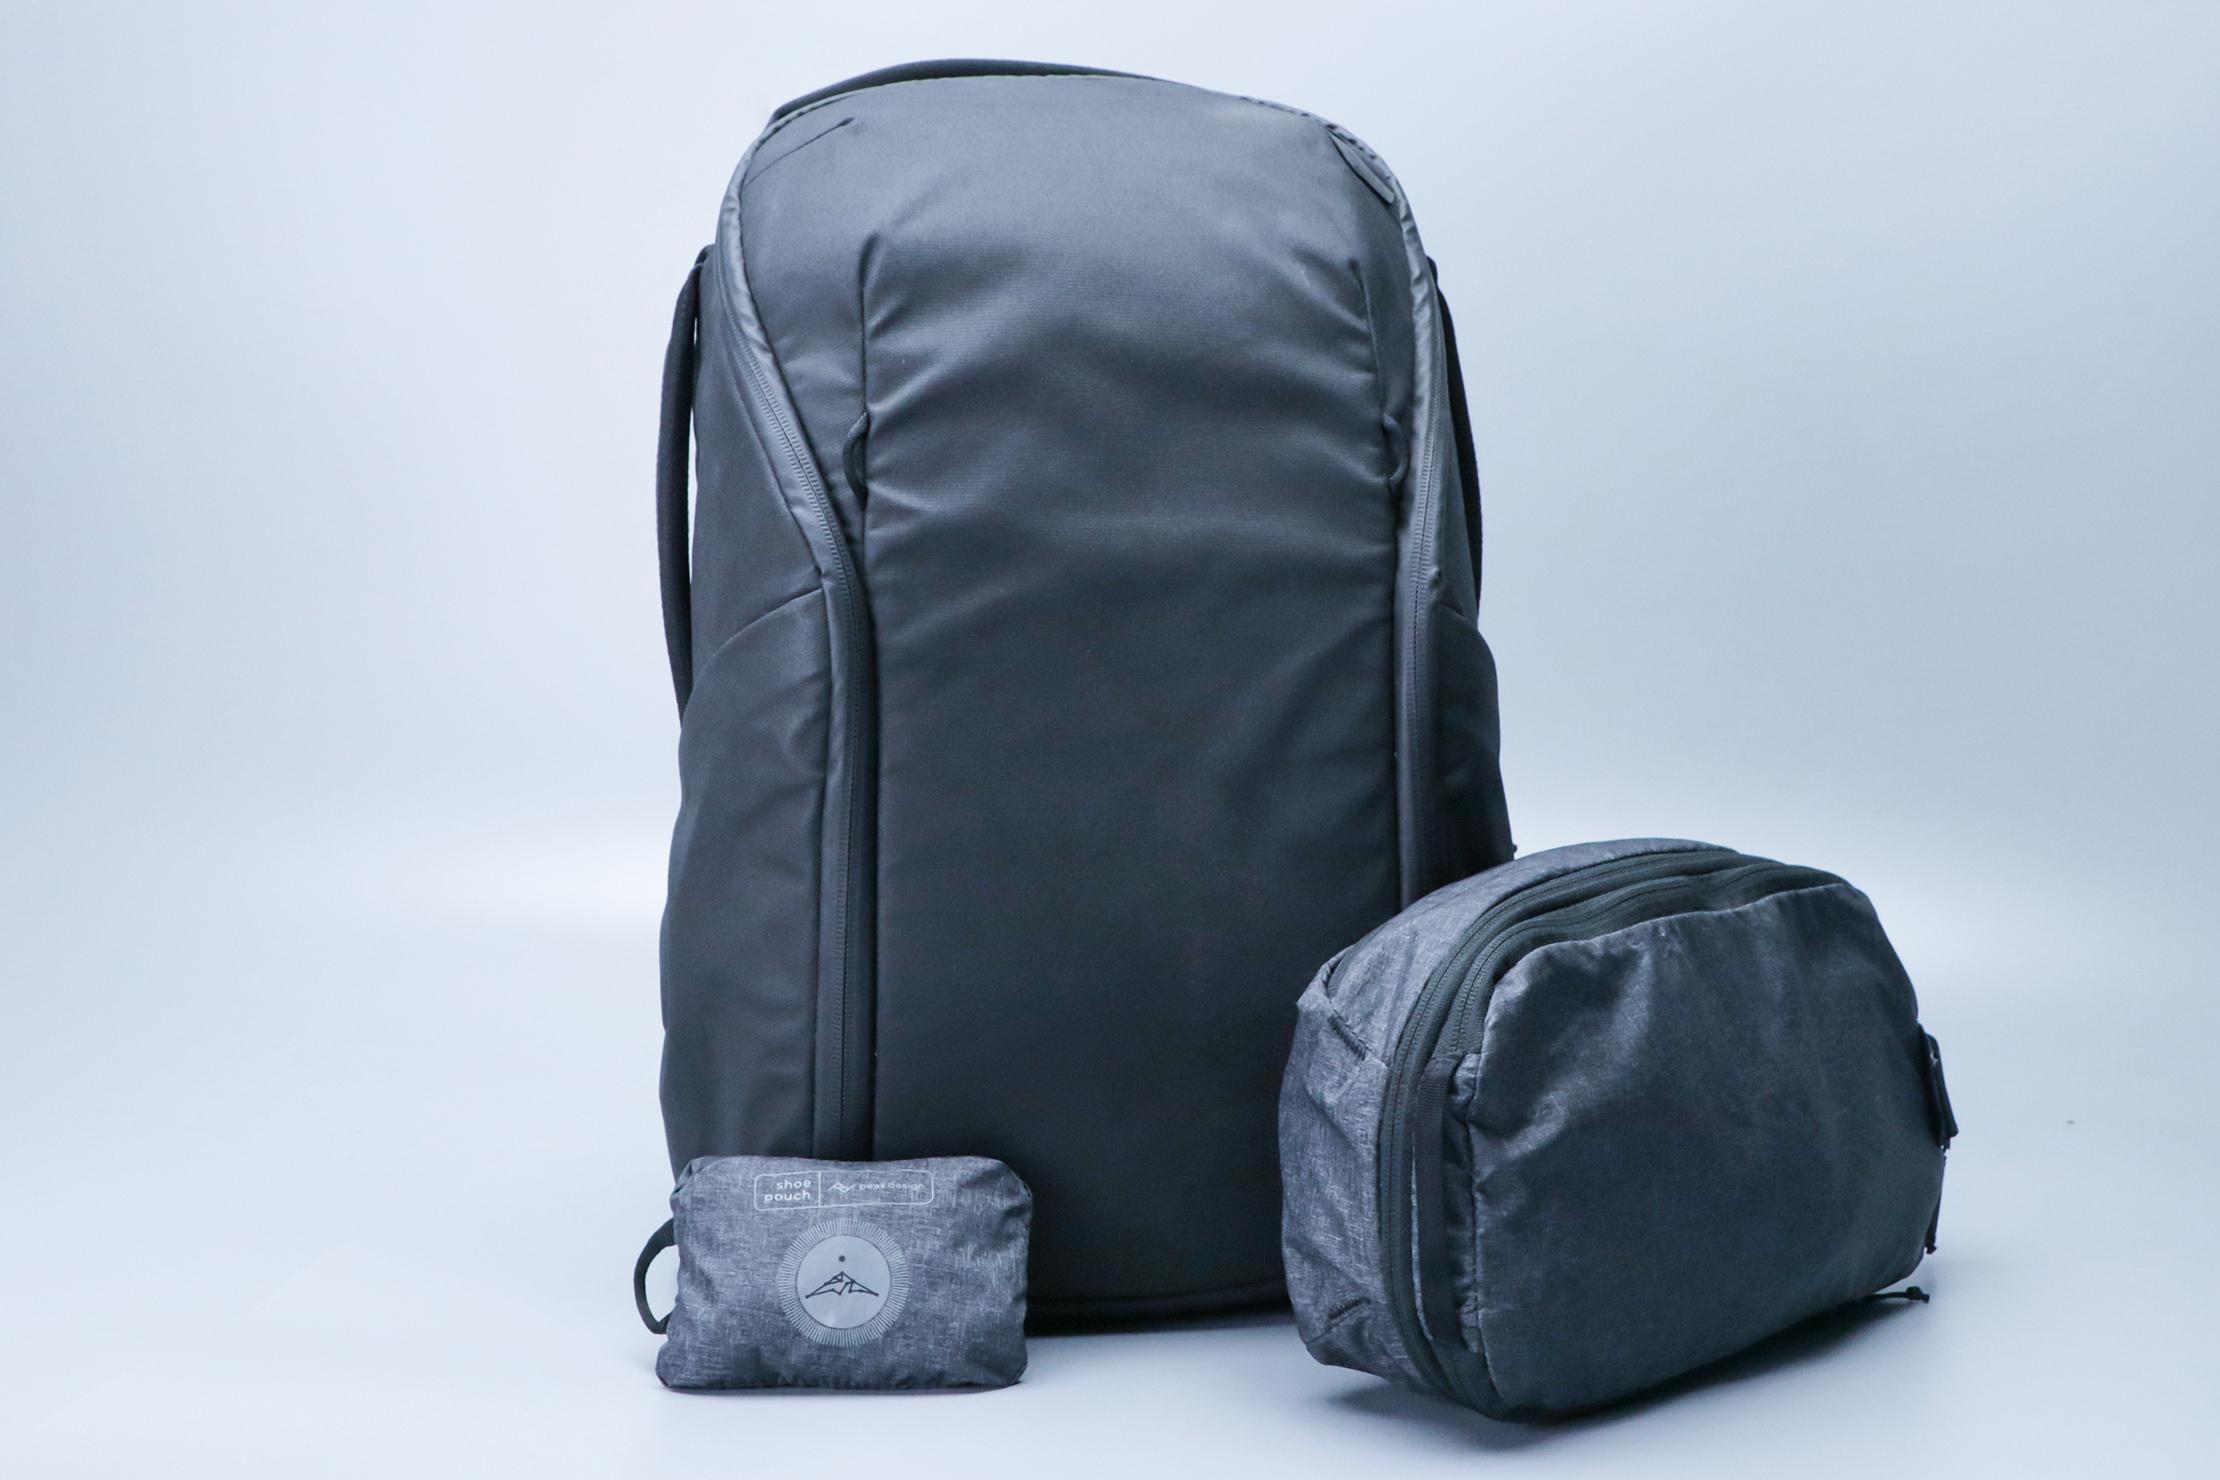 Peak Design Shoe Pouch with Peak Design Travel Backpack